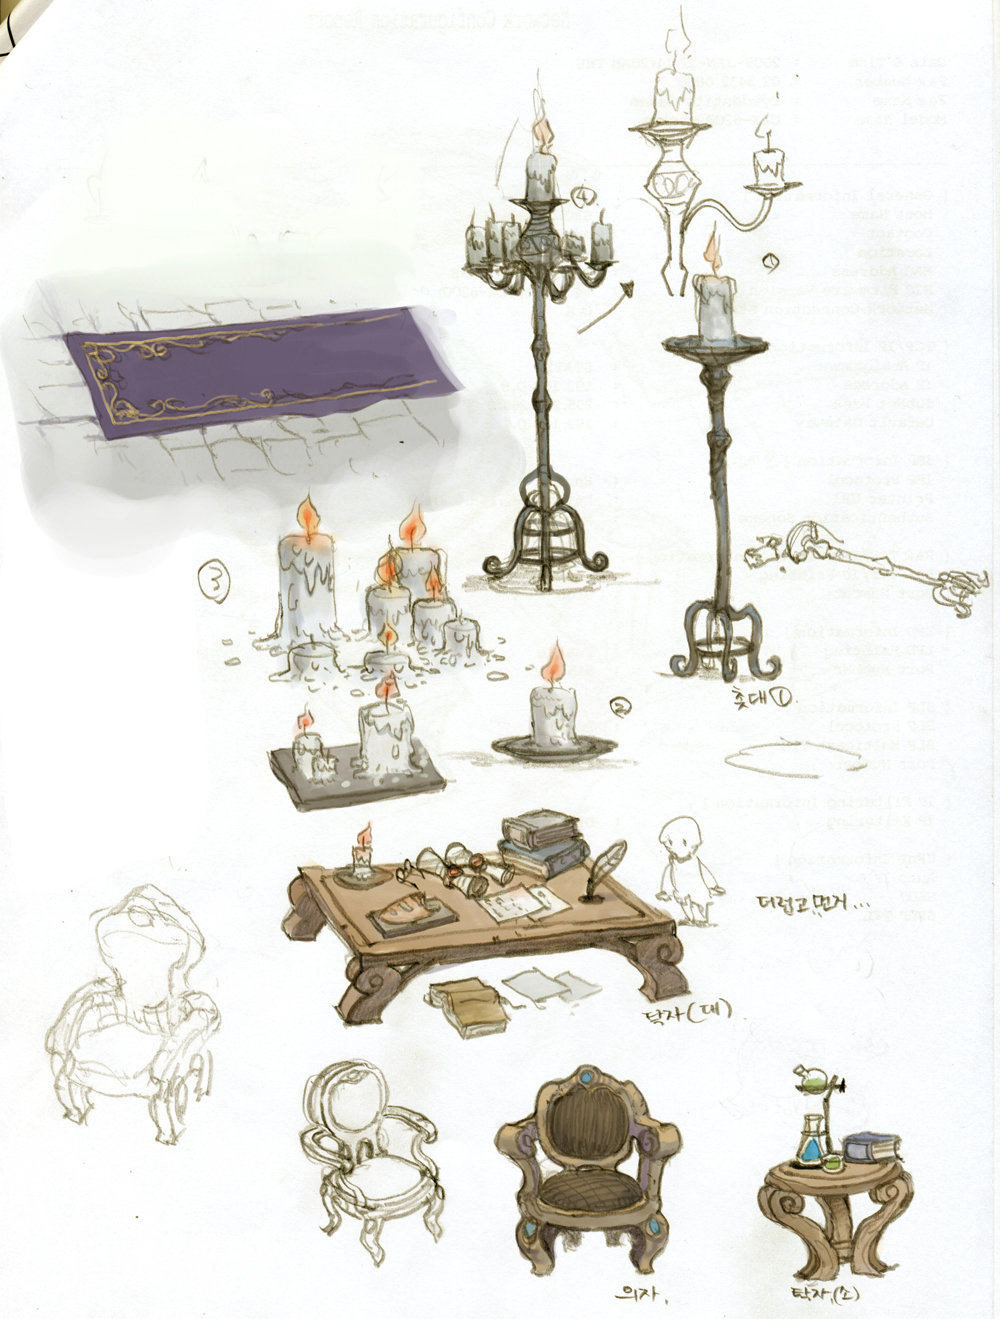 Seung chan lee bg catacomb 14